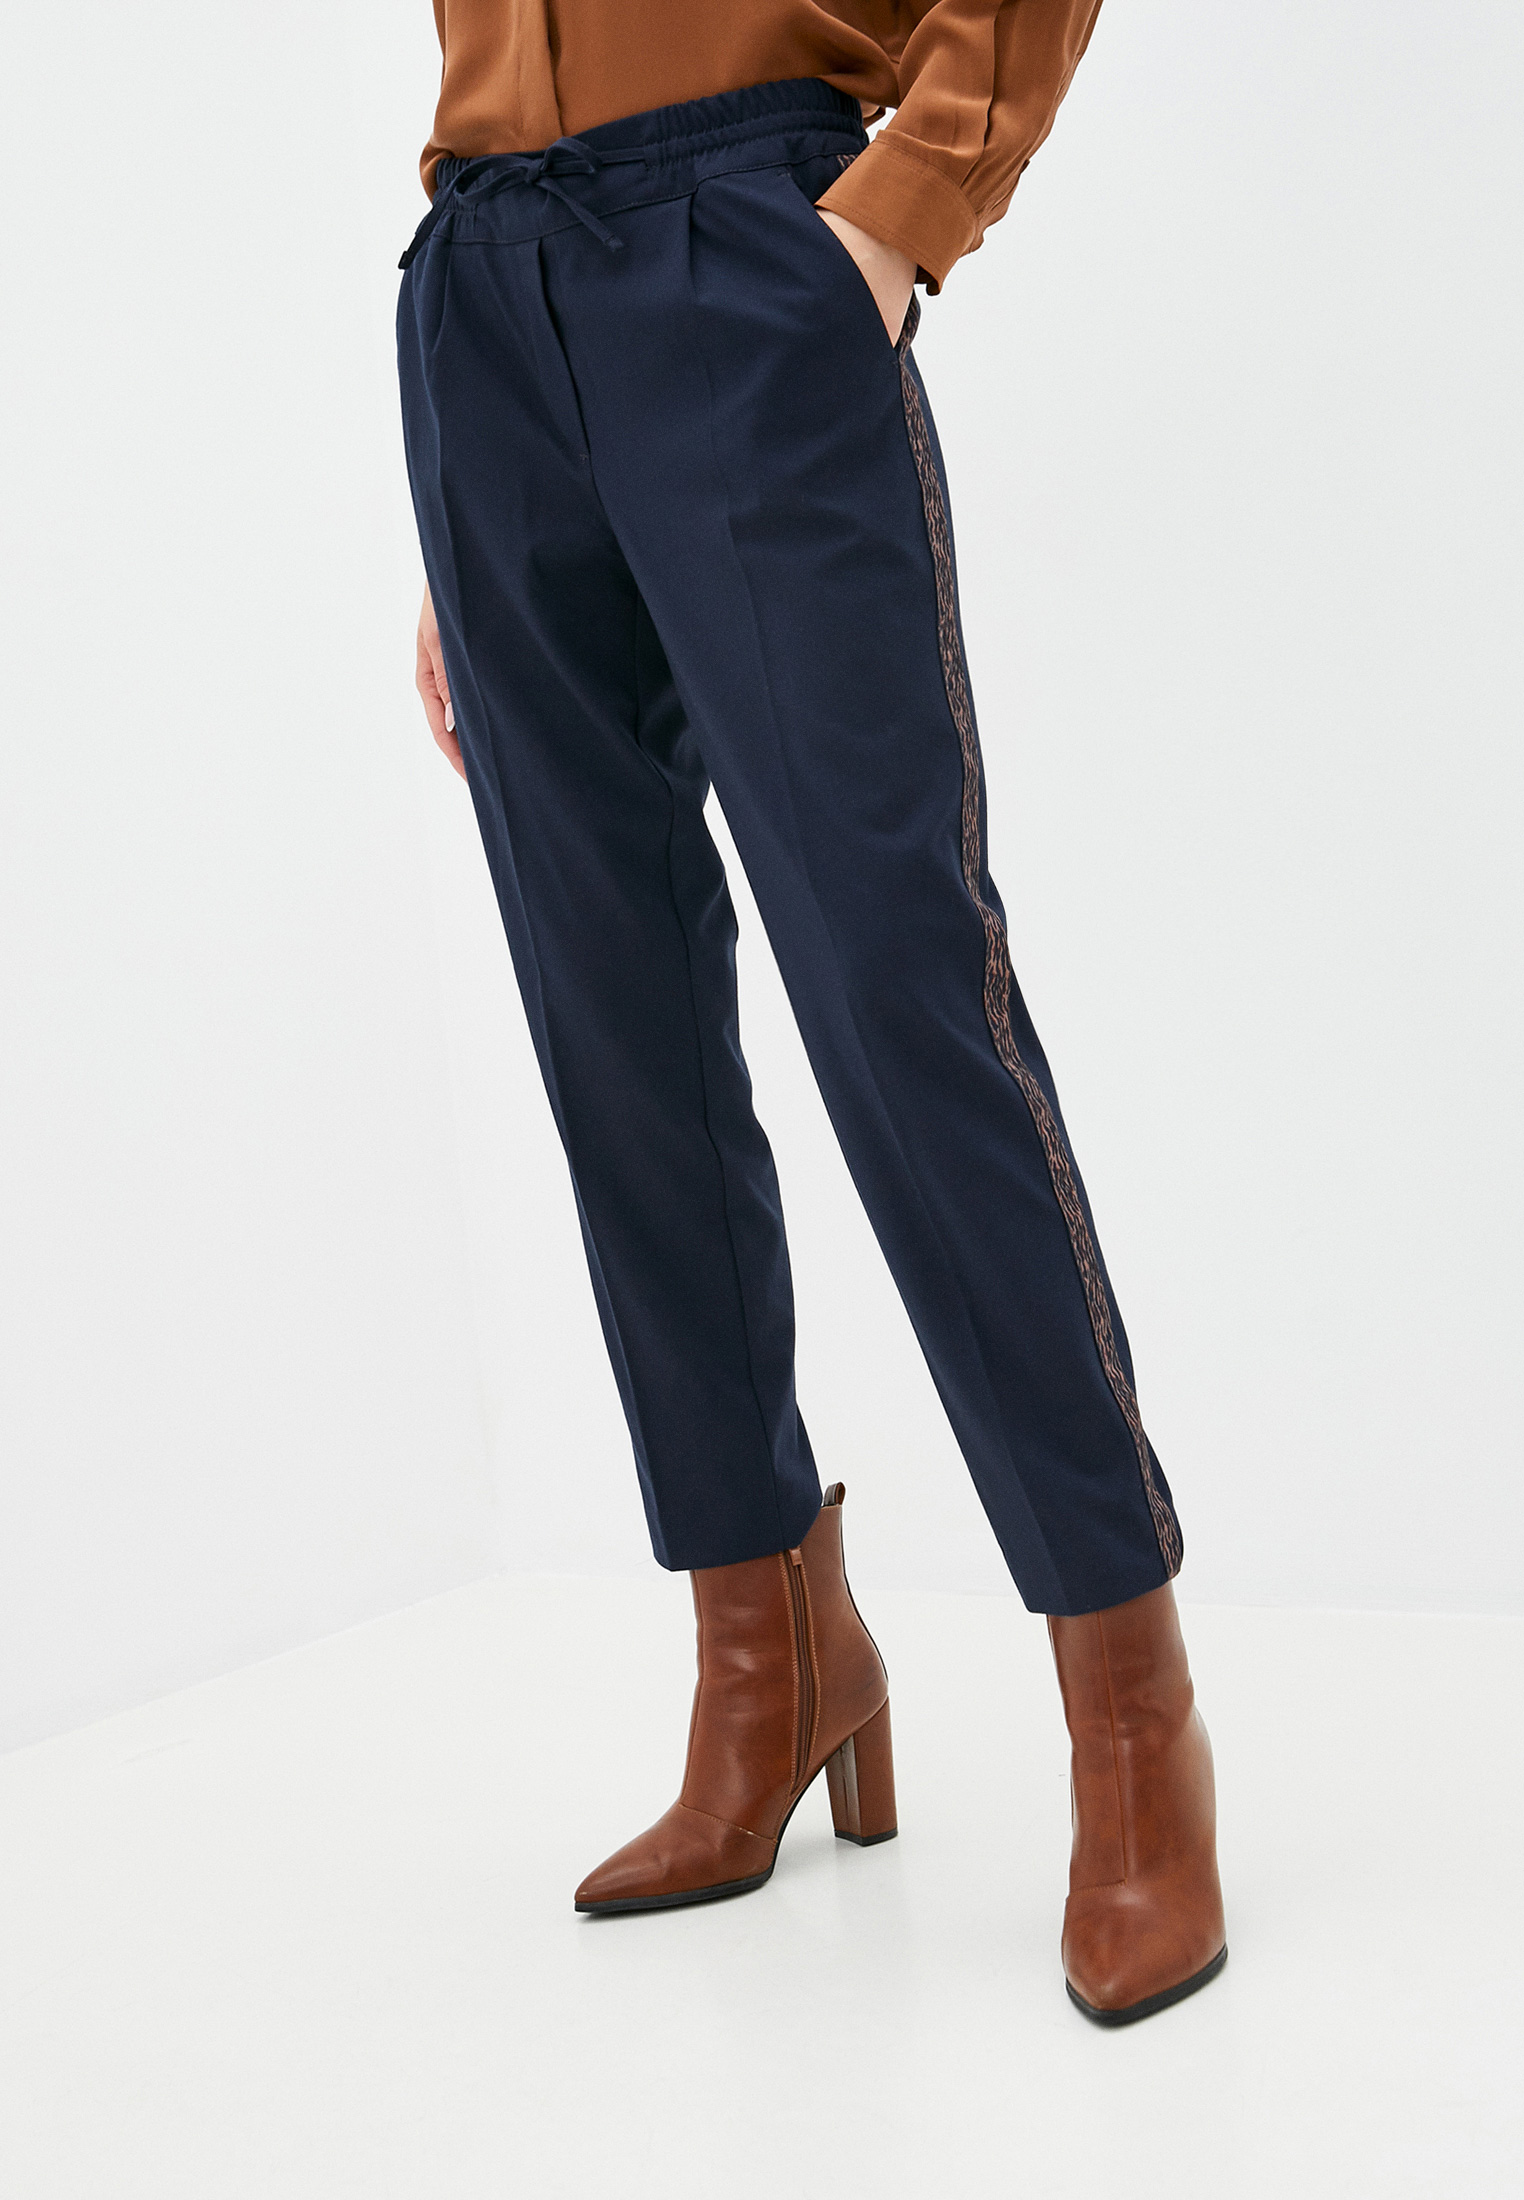 Женские прямые брюки Betty Barclay 6169/1077